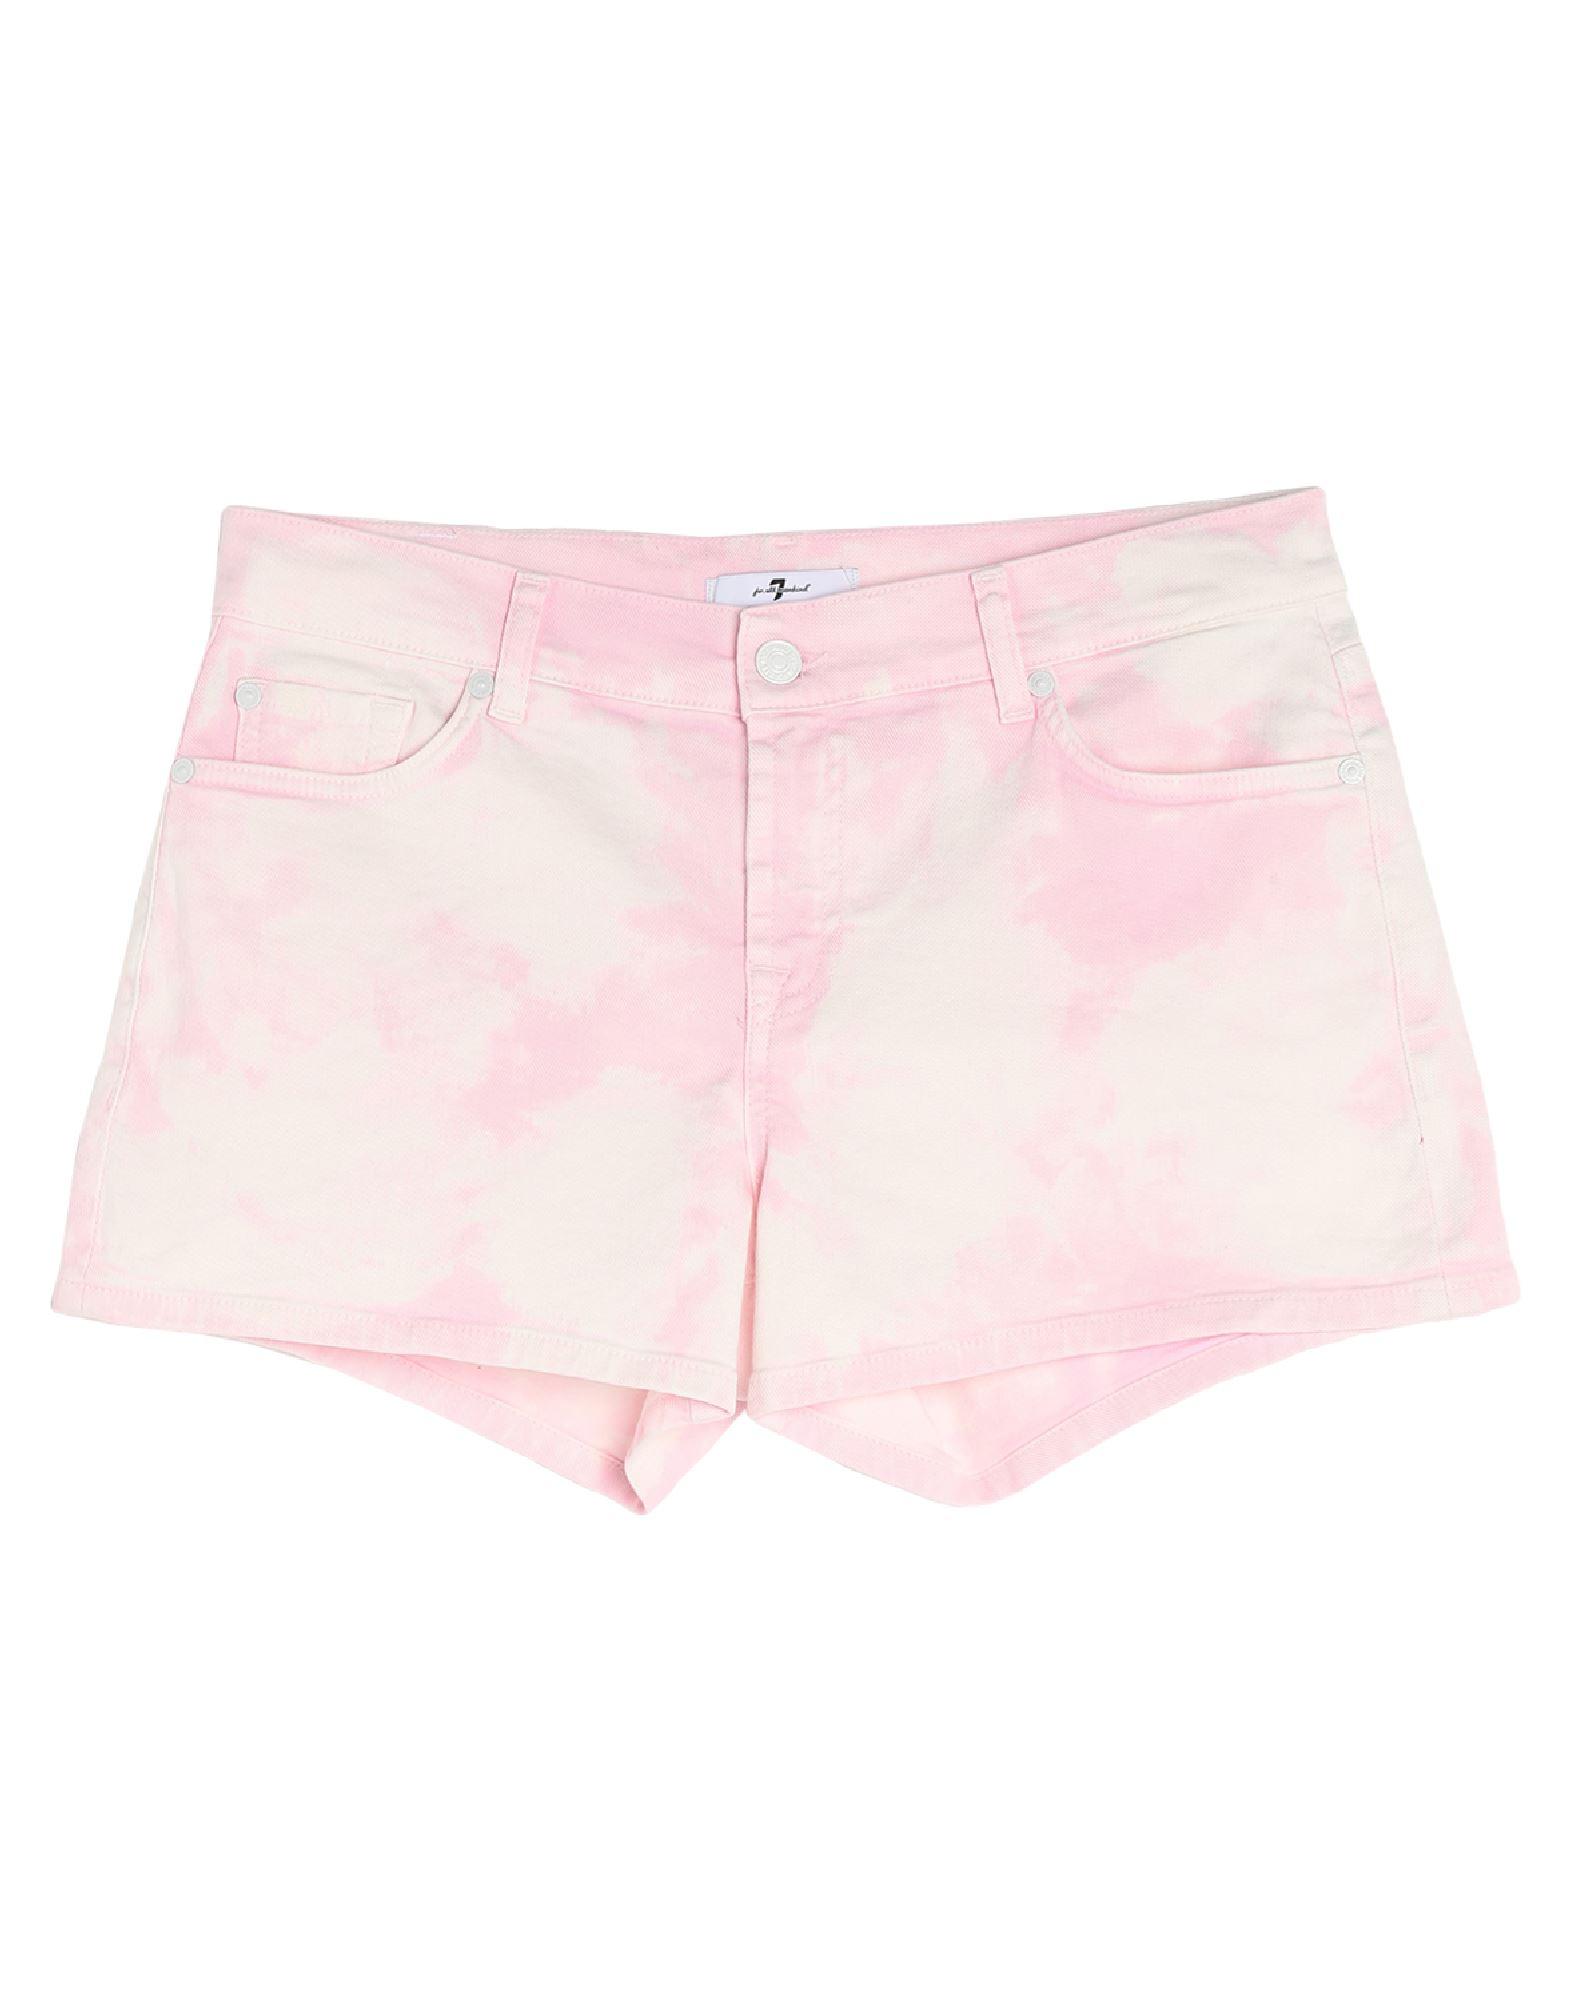 7 FOR ALL MANKIND Denim shorts - Item 42781489